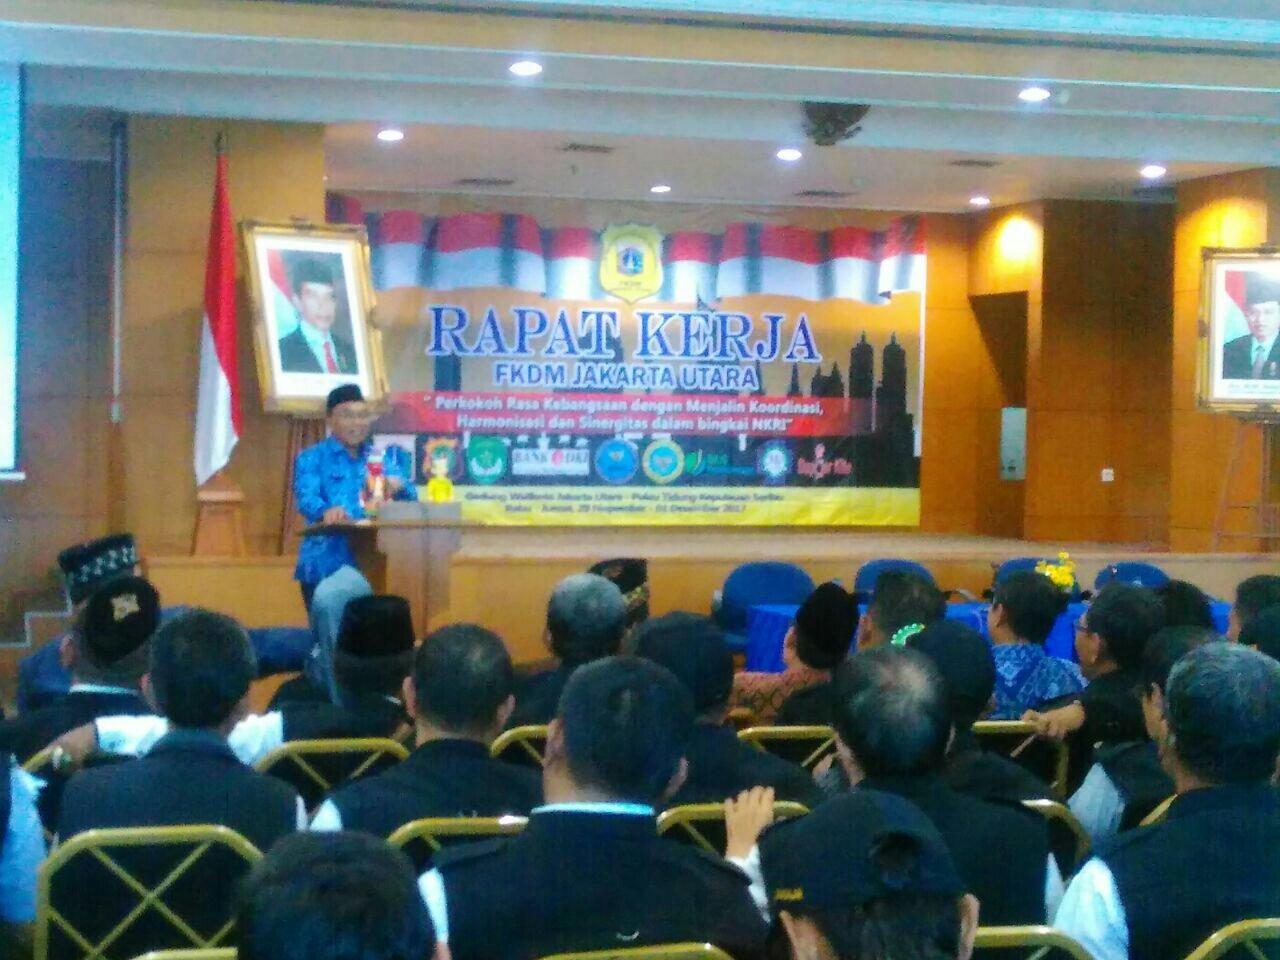 Rapat Kerja Fkdm Kota Administrasi Jakarta Utara Sukapura Kewaspadaan Dini